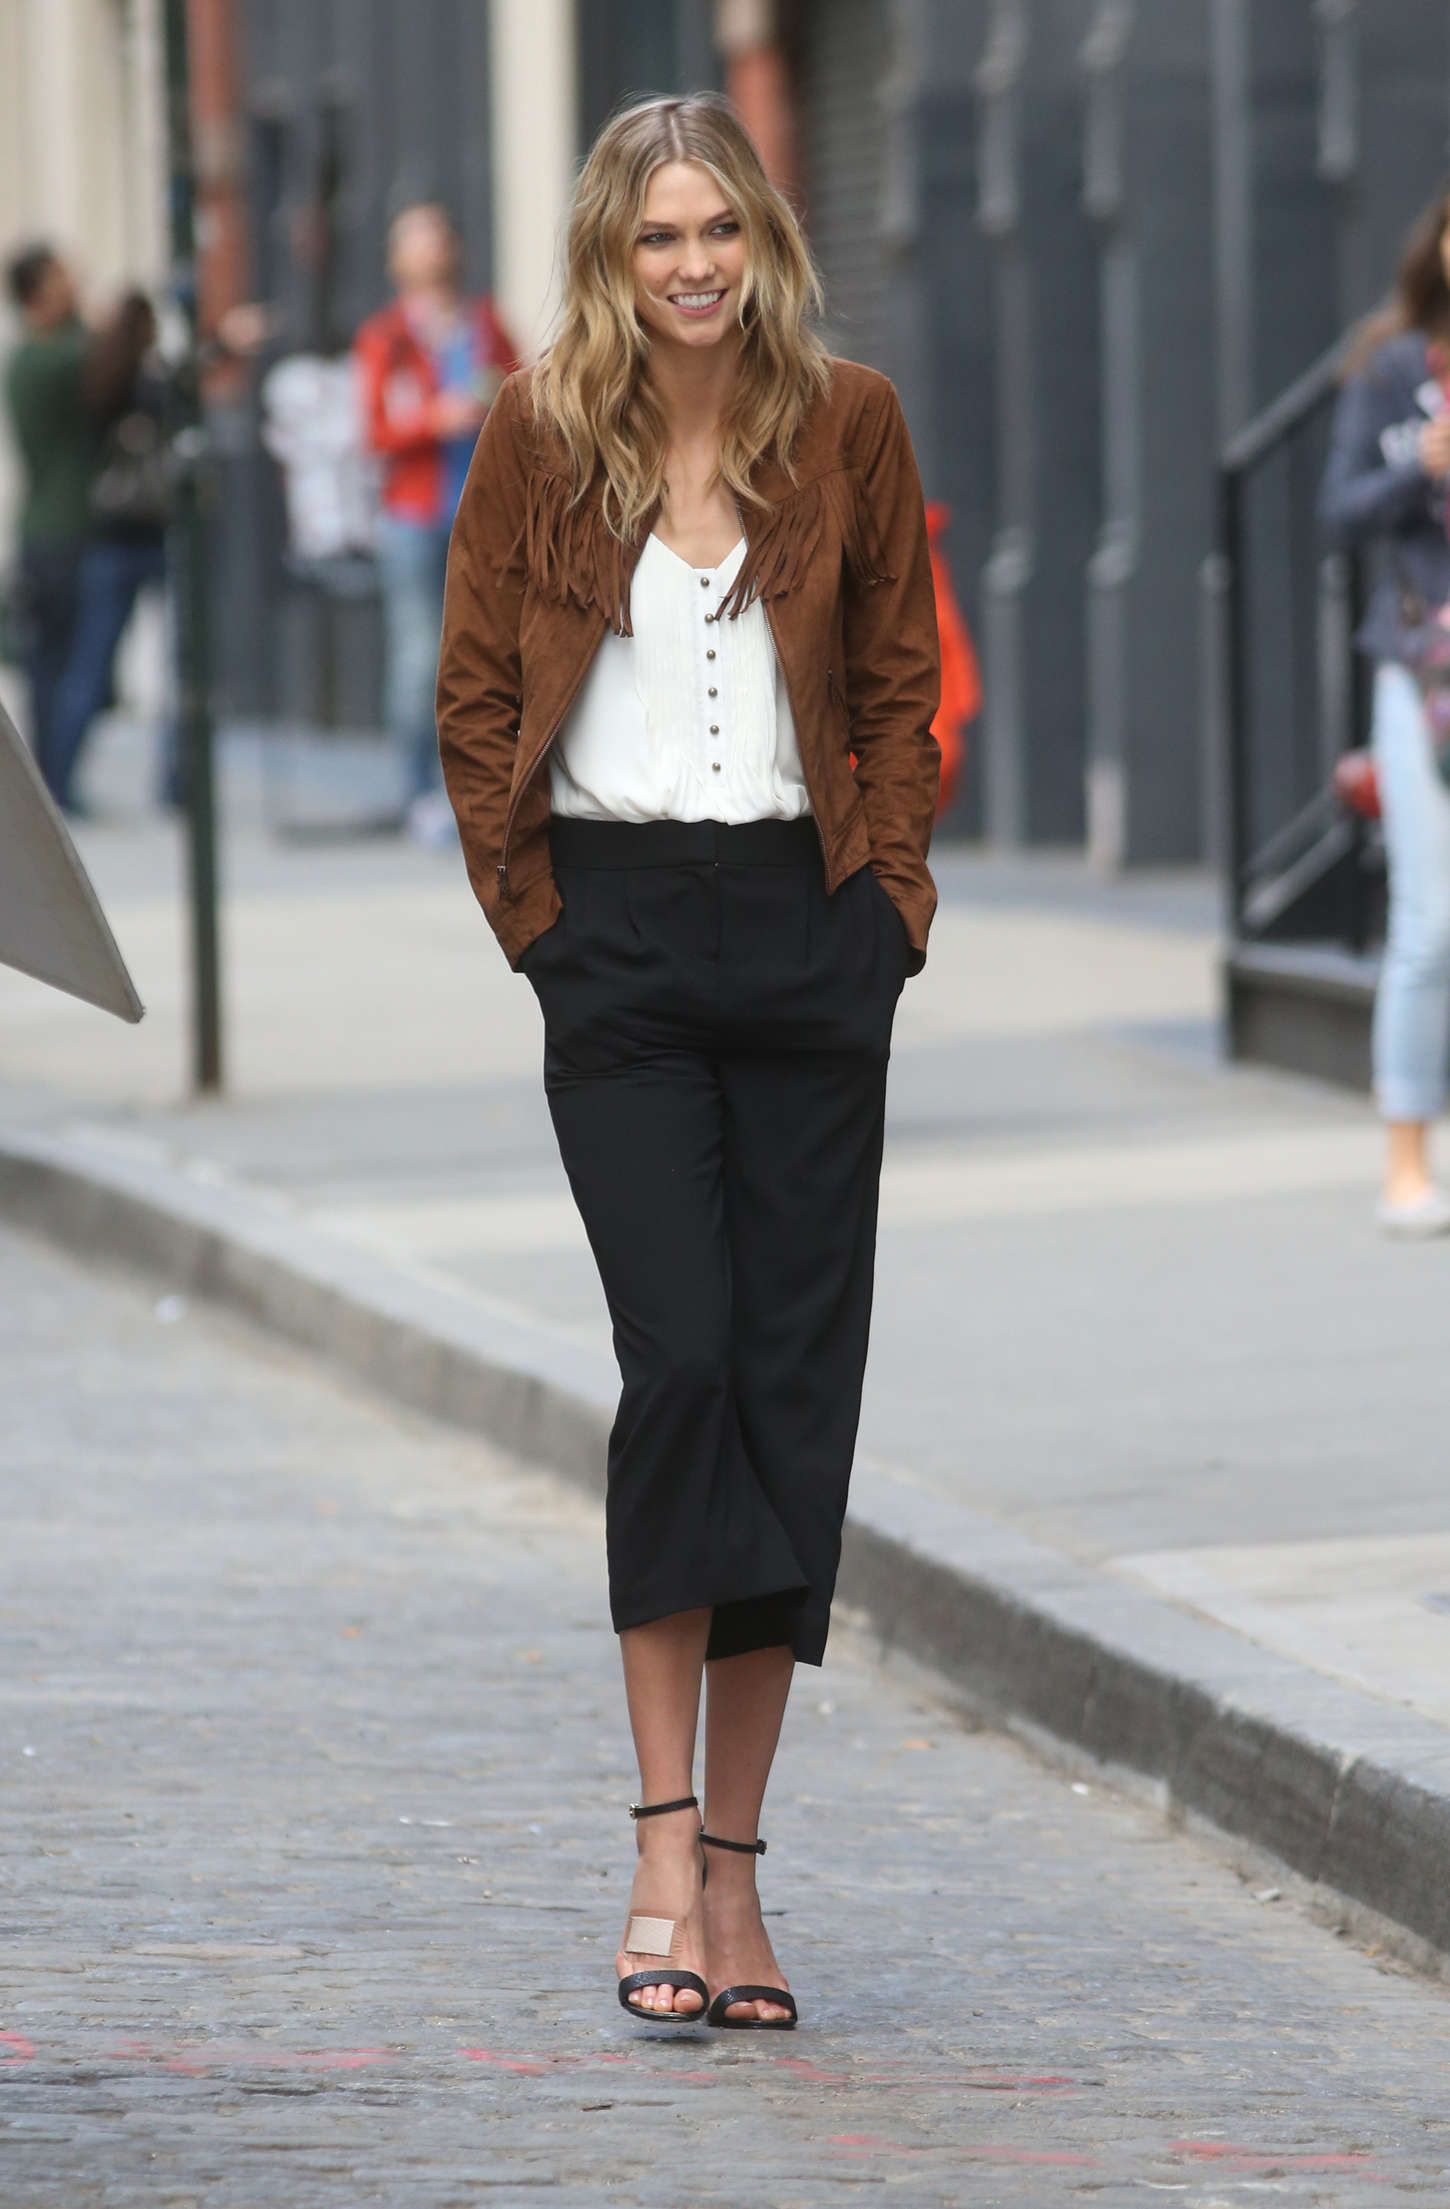 Karlie Kloss 2015 : Karlie Kloss: Photoshoot in NYC -48